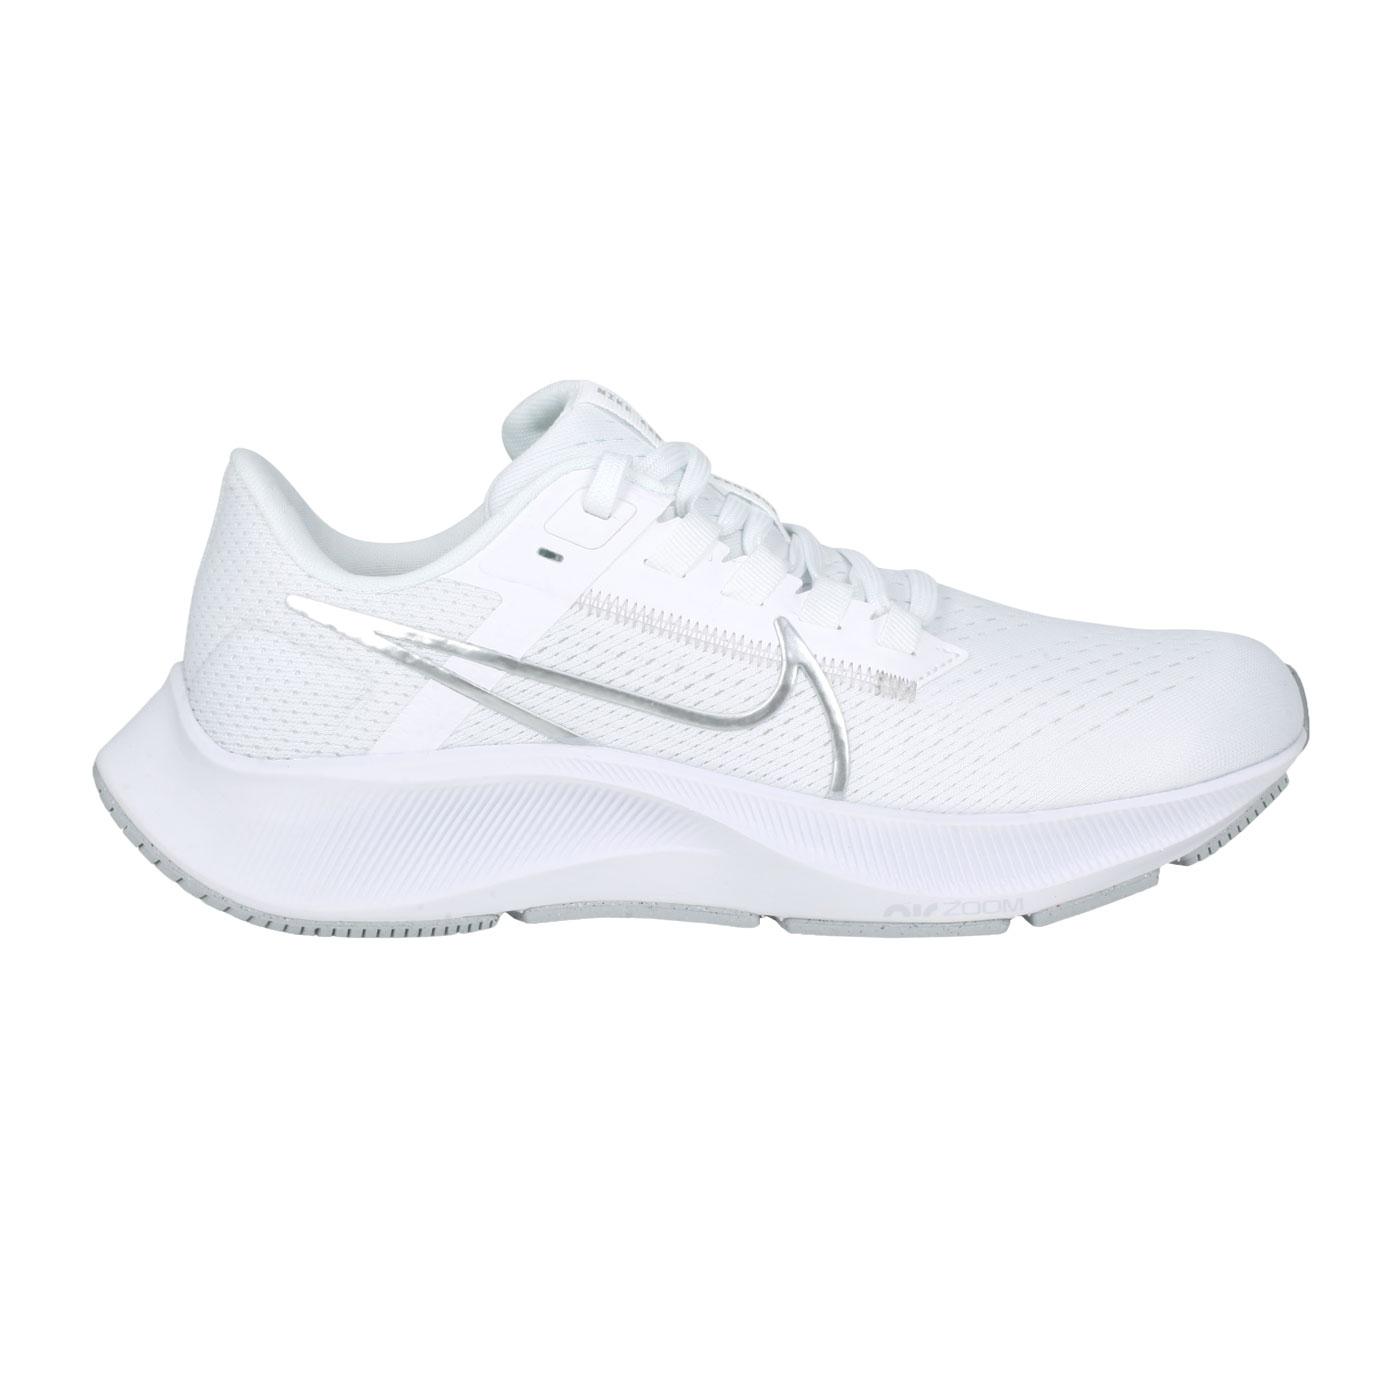 NIKE 女款慢跑鞋  @WMNS AIR ZOOM PEGASUS 38@CW7358-100